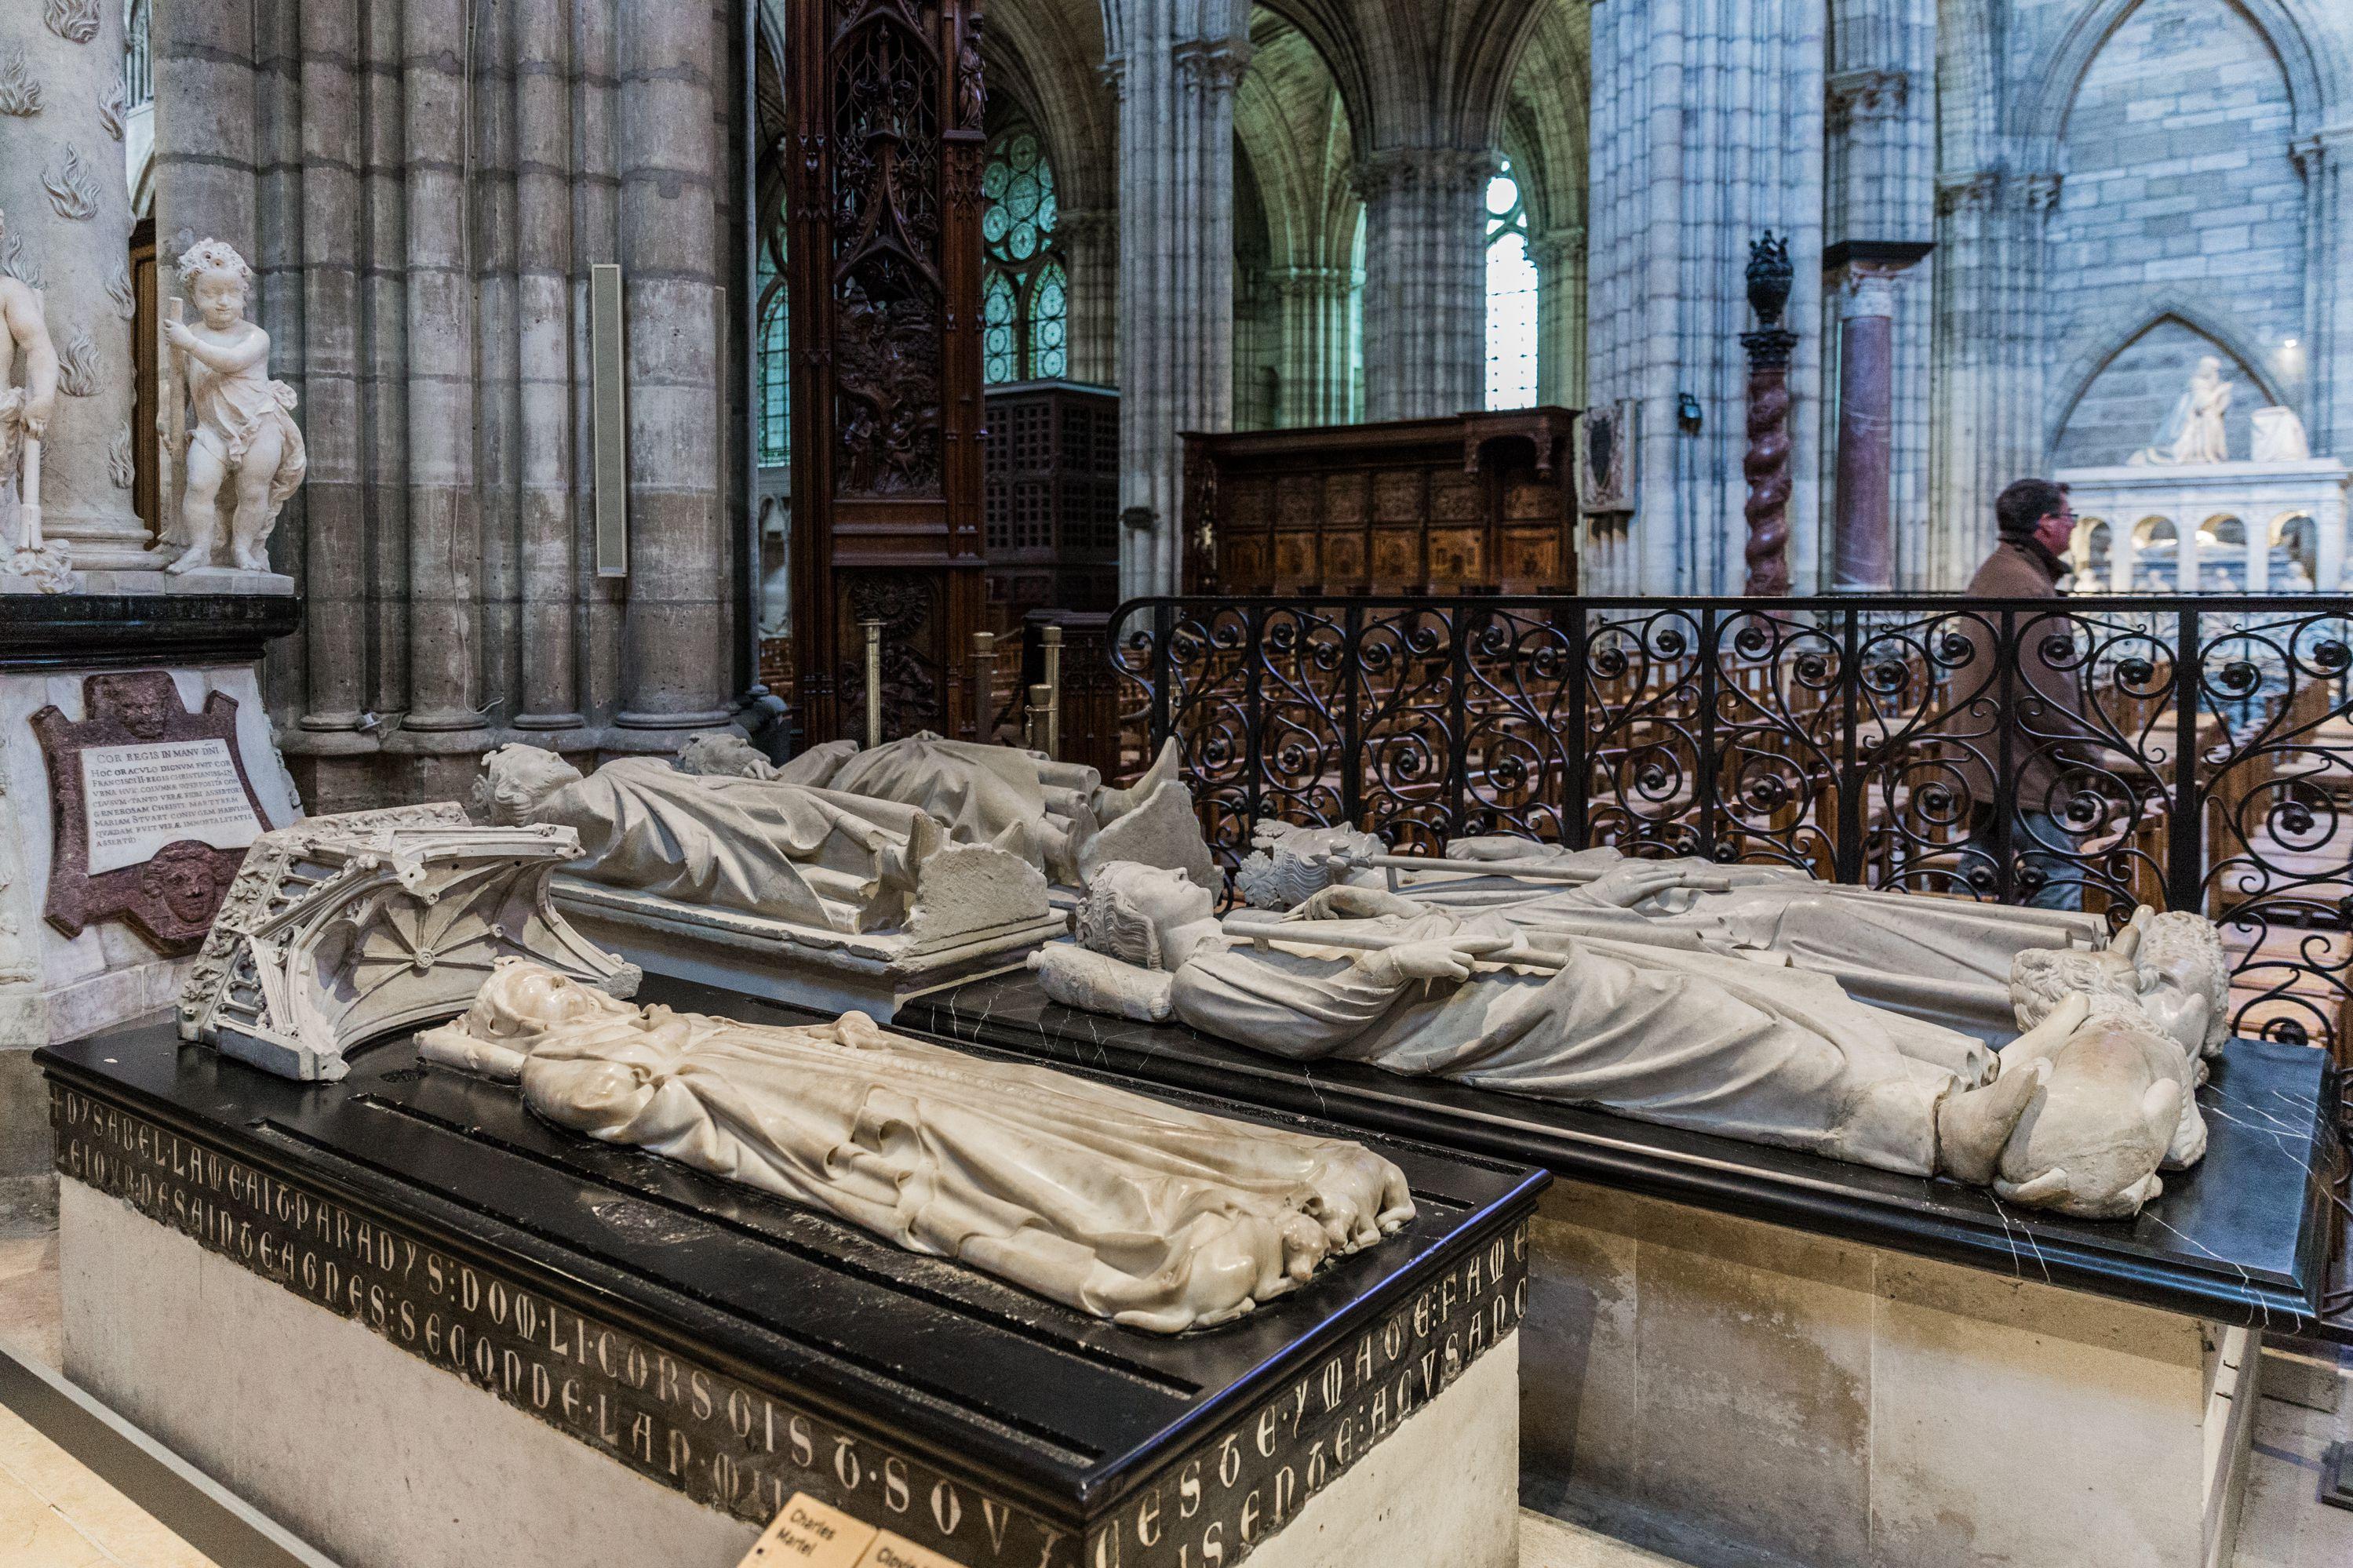 Basílica Catedral de Saint-Denis, Real Necrópolis de los Reyes y Reinas de Francia, Necrópolis de la Reyes de Francia